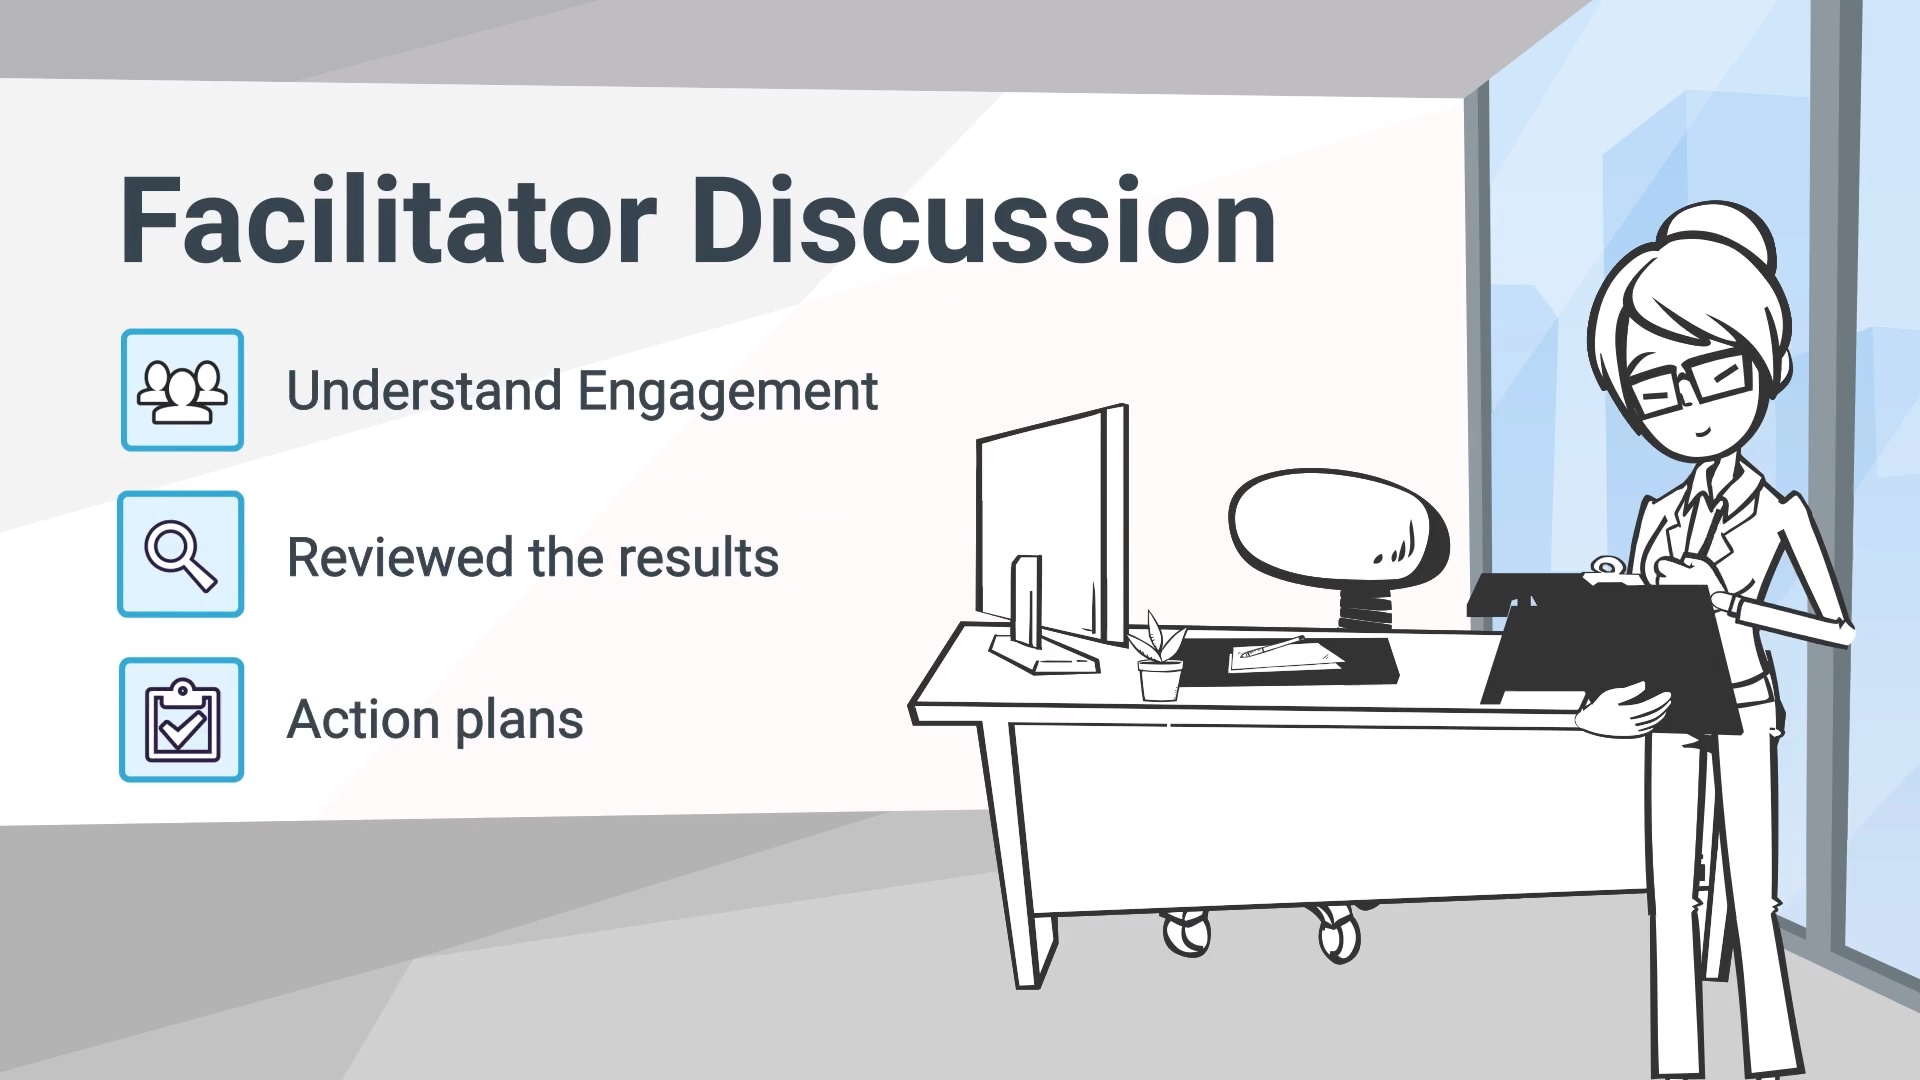 Facilitator Discussion